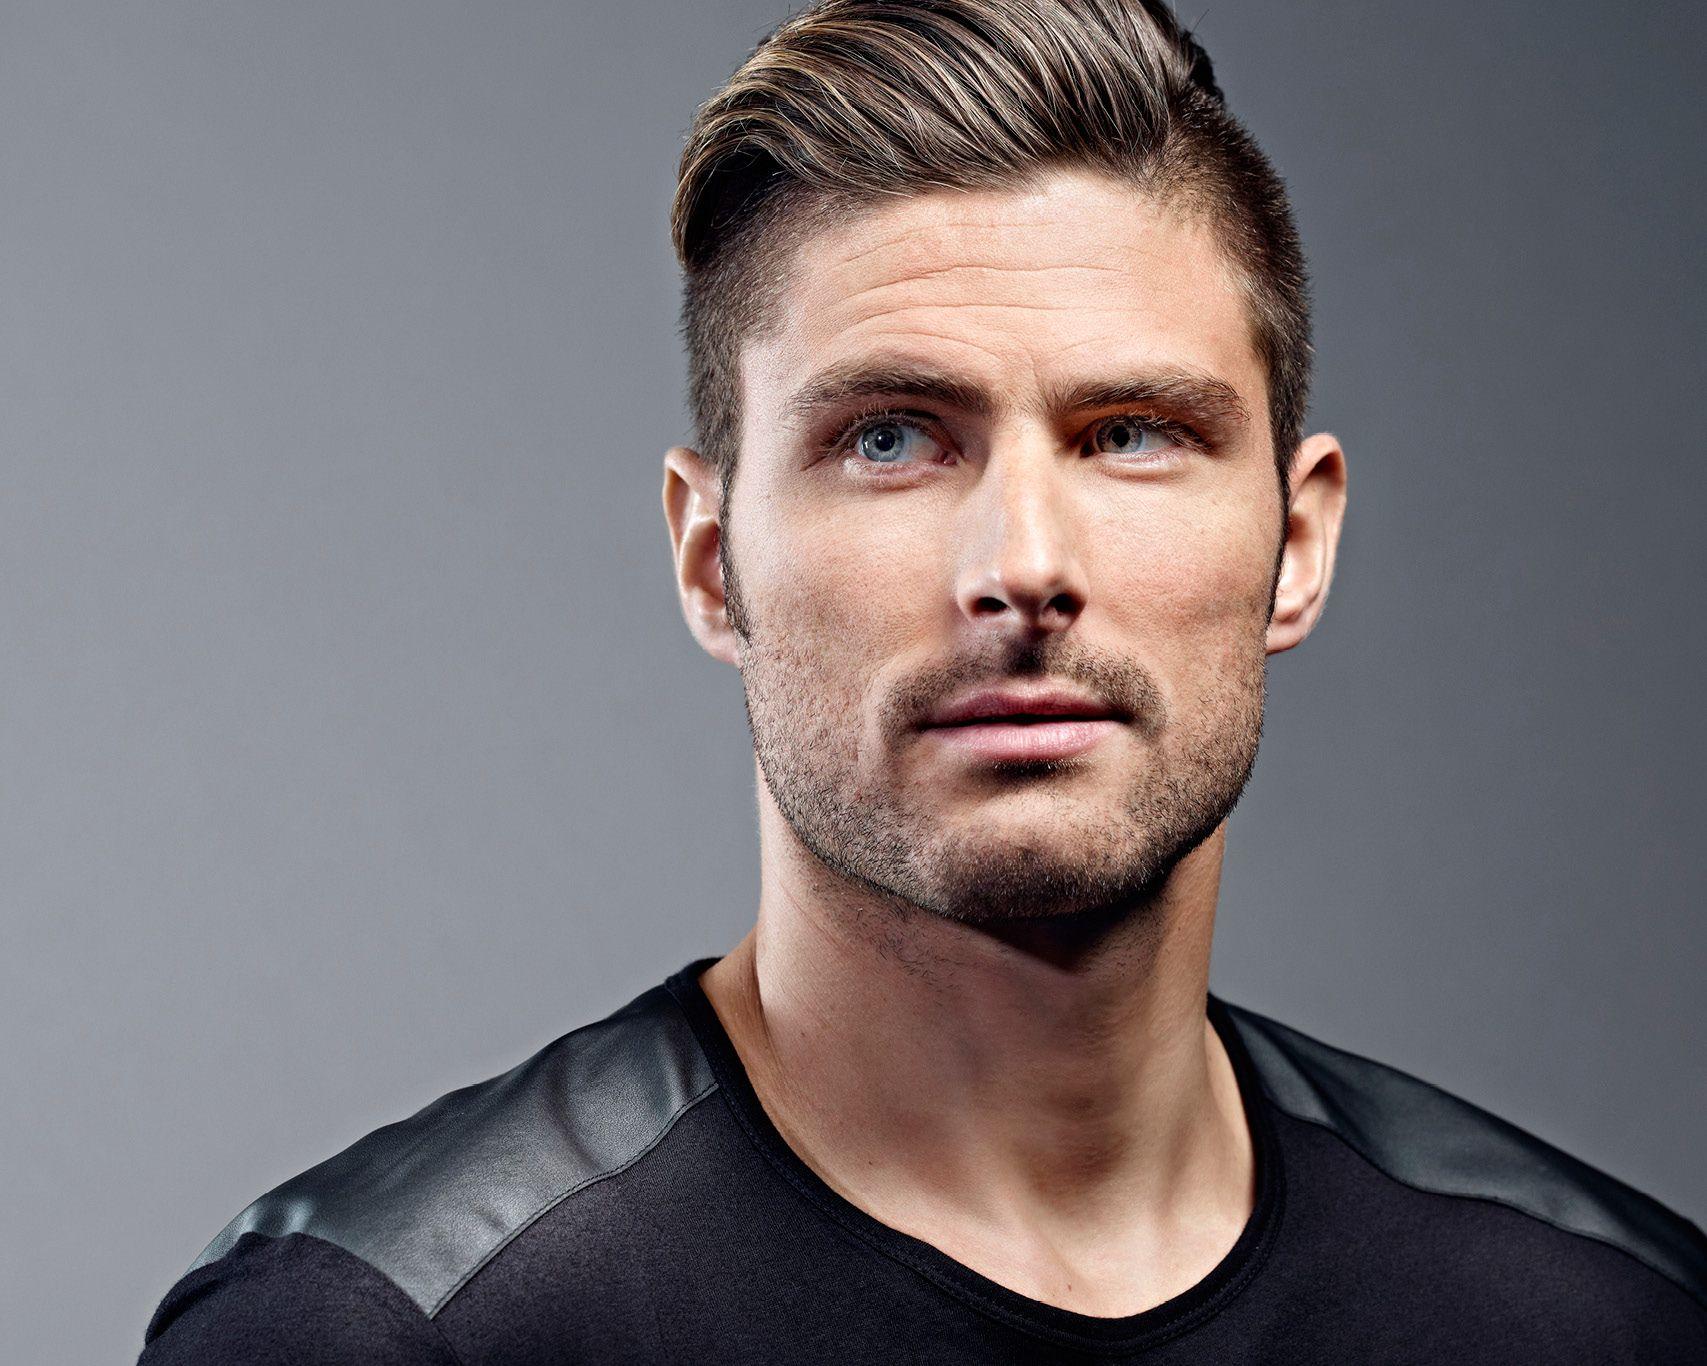 Giroud Arsenal Haircut